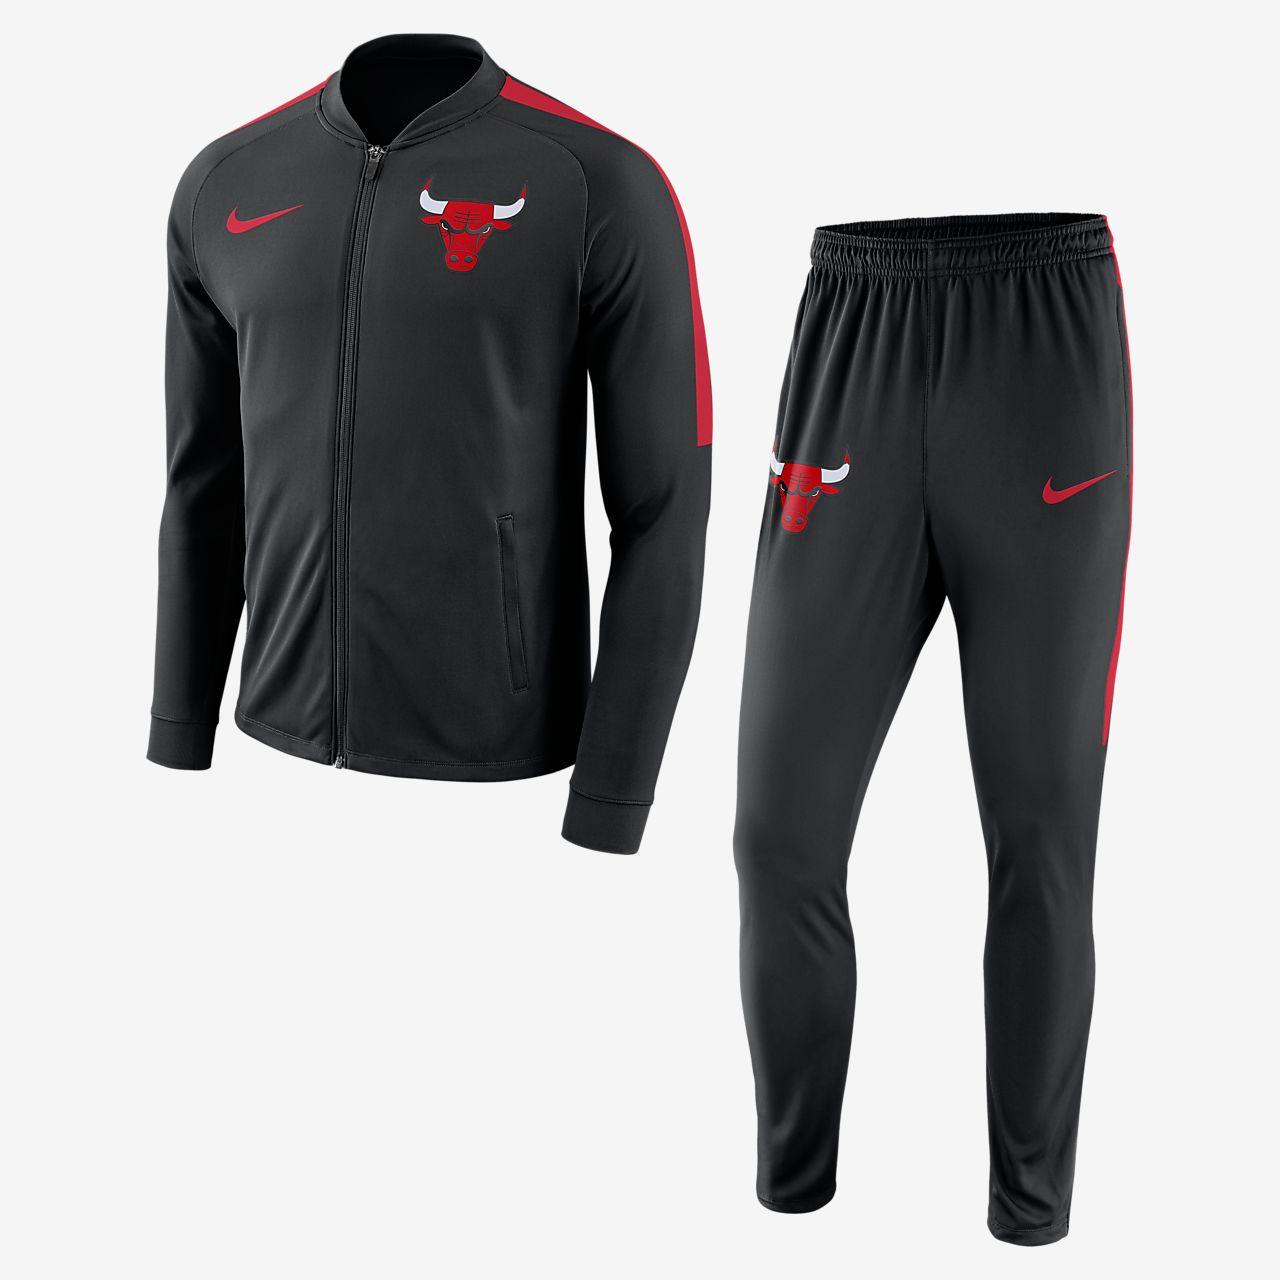 ... Chicago Bulls Nike Dry NBA-Trainingsanzug für Herren